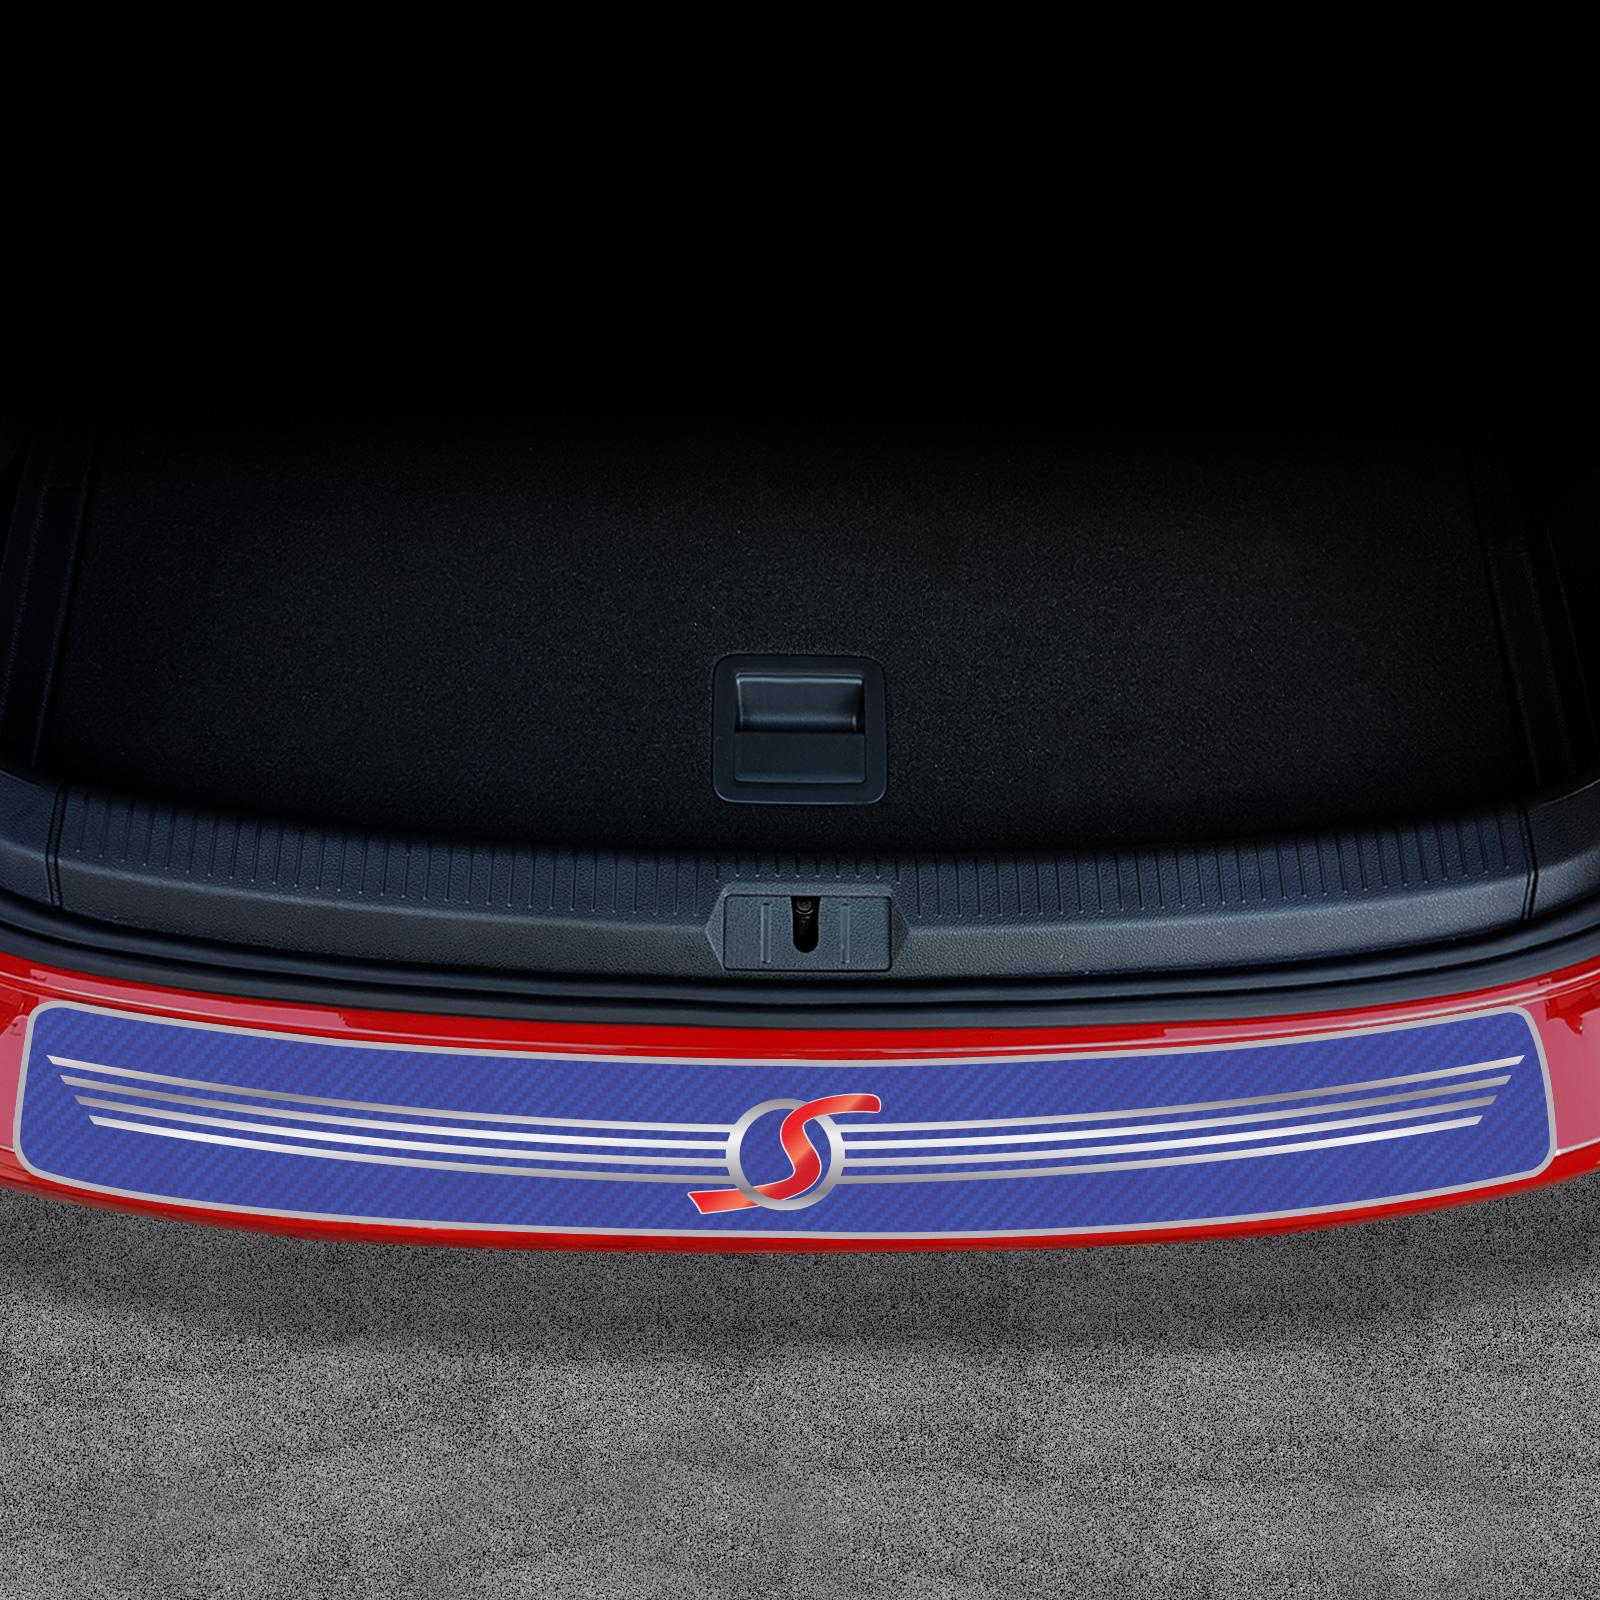 REAR BUMPER SILL PROTECTOR TRIM COVER STEEL CARBON BMW X3 FL e83 2007-2010